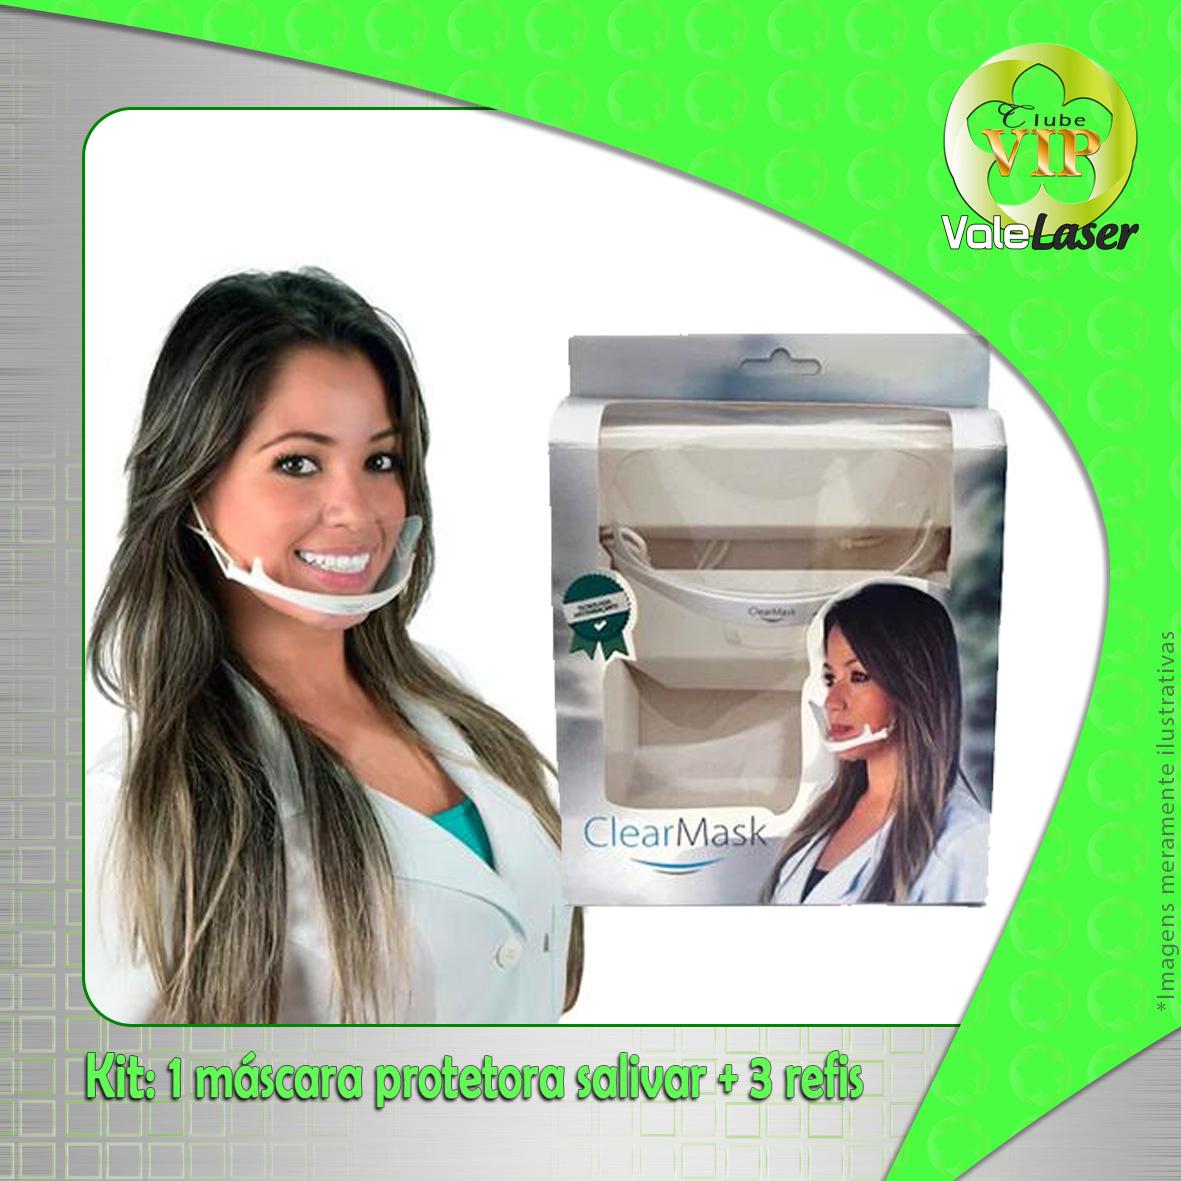 Kit 1 Máscara de proteção salivar + 3 refis